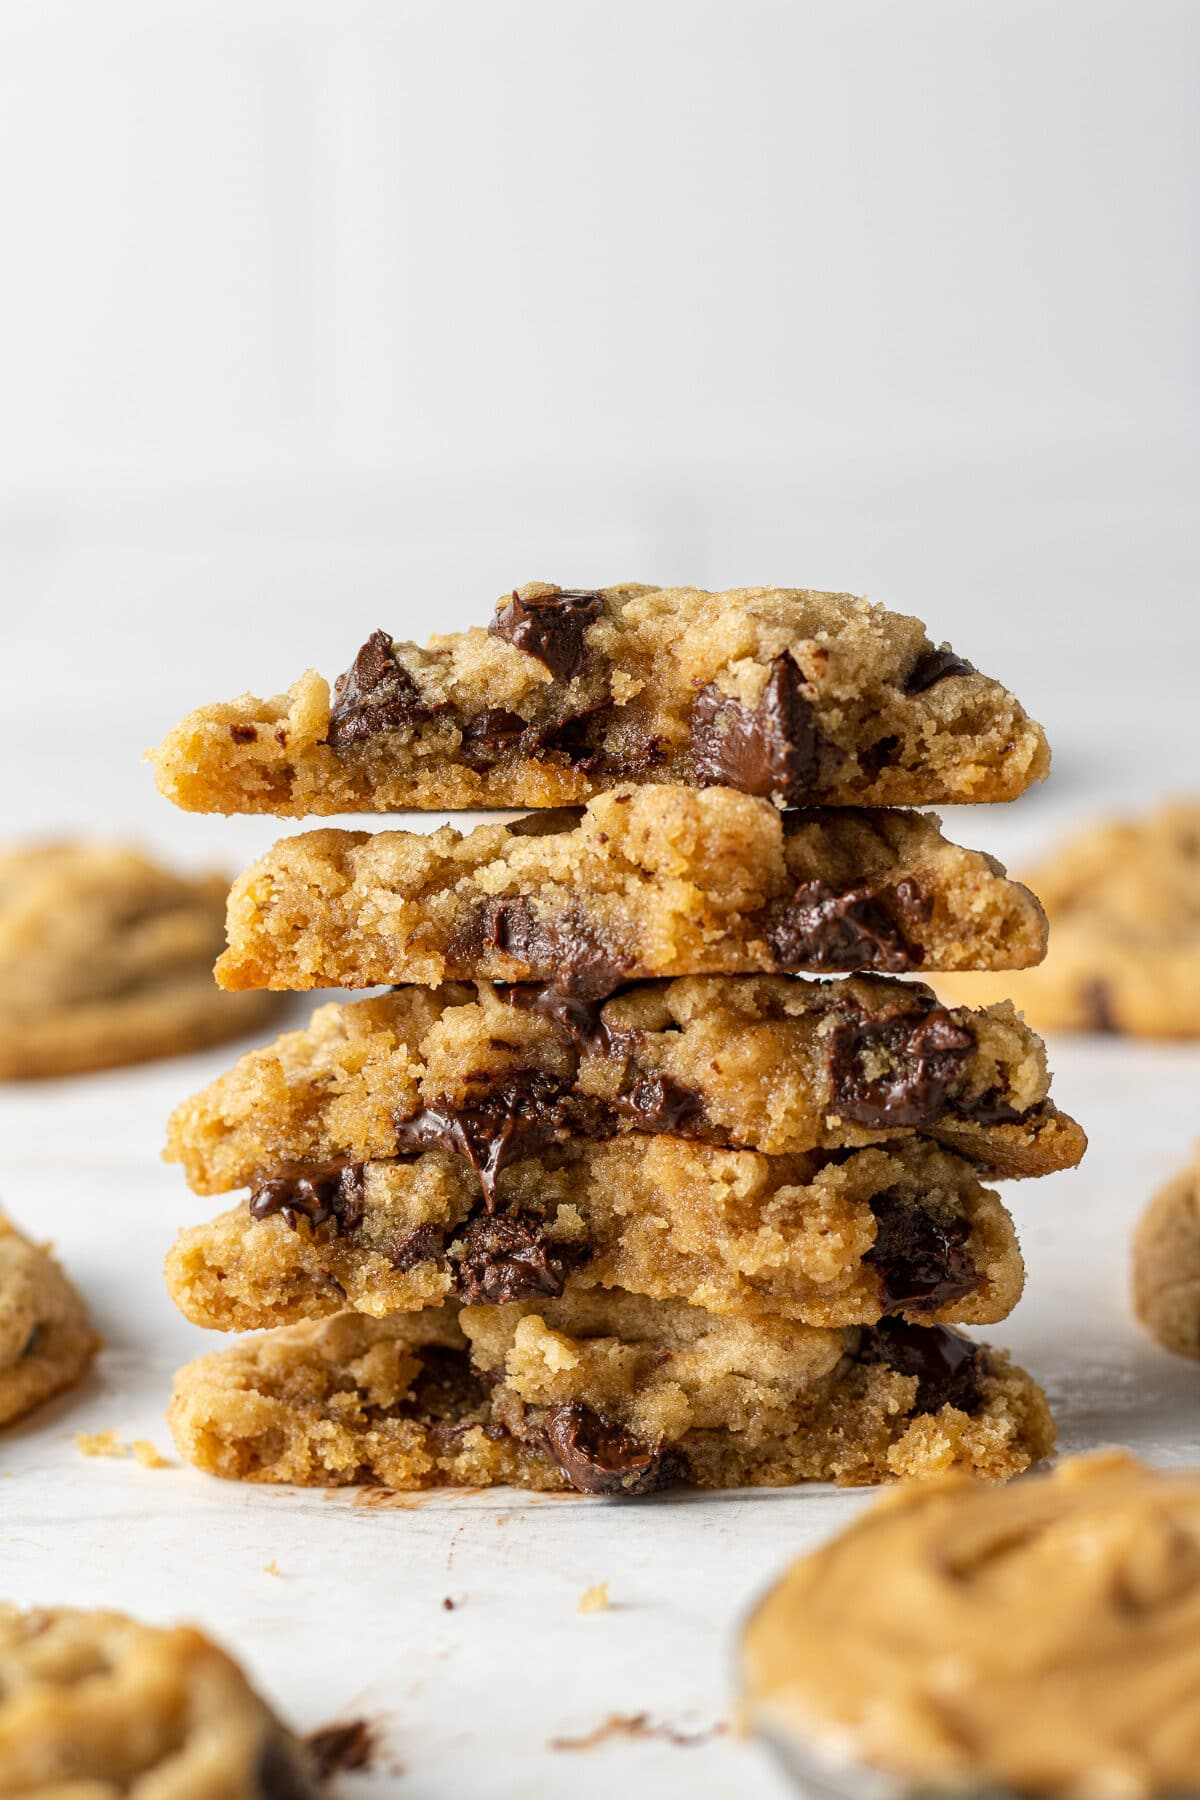 vegan peanut butter cookies split in half with more cookies around them